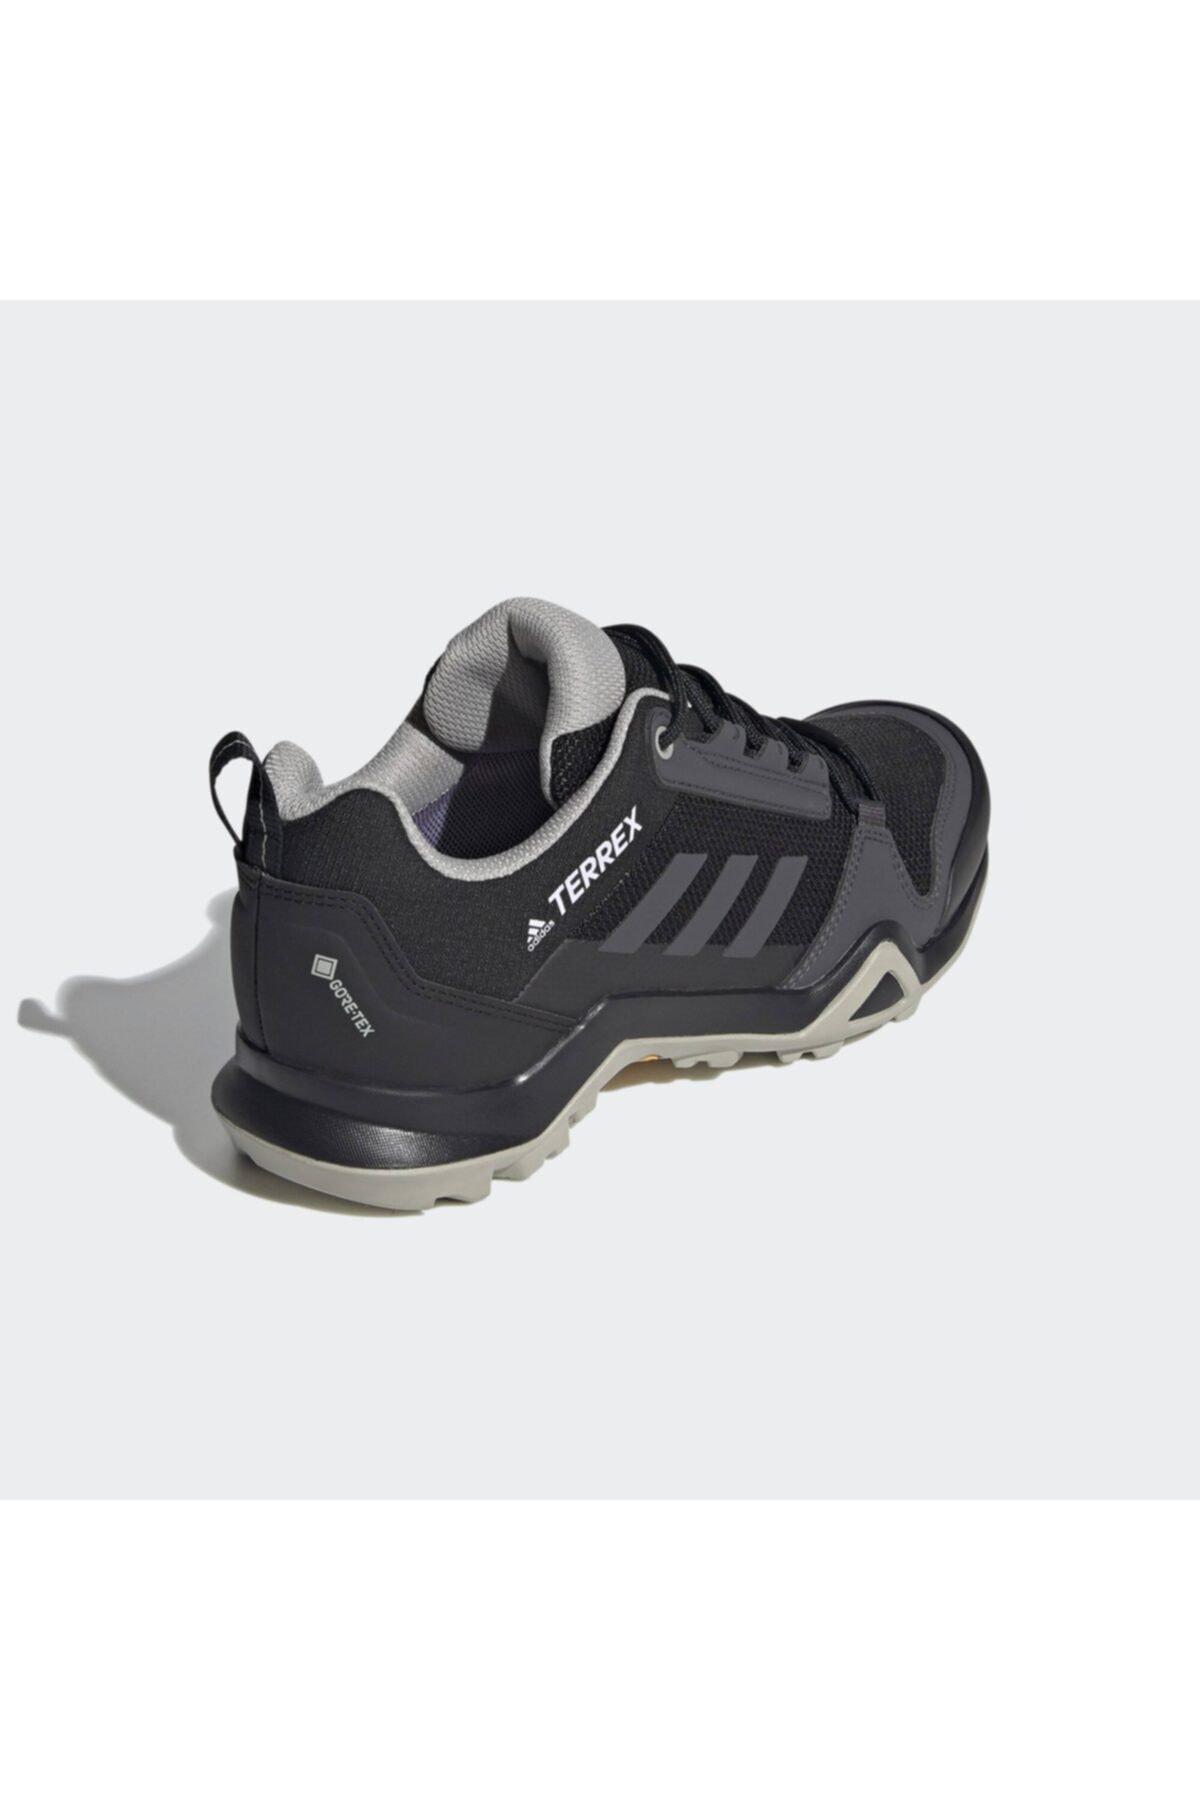 adidas Kadın Siyah Outdoor Ayakkabı Terrex Ax3 Gtx W Ef3510 2